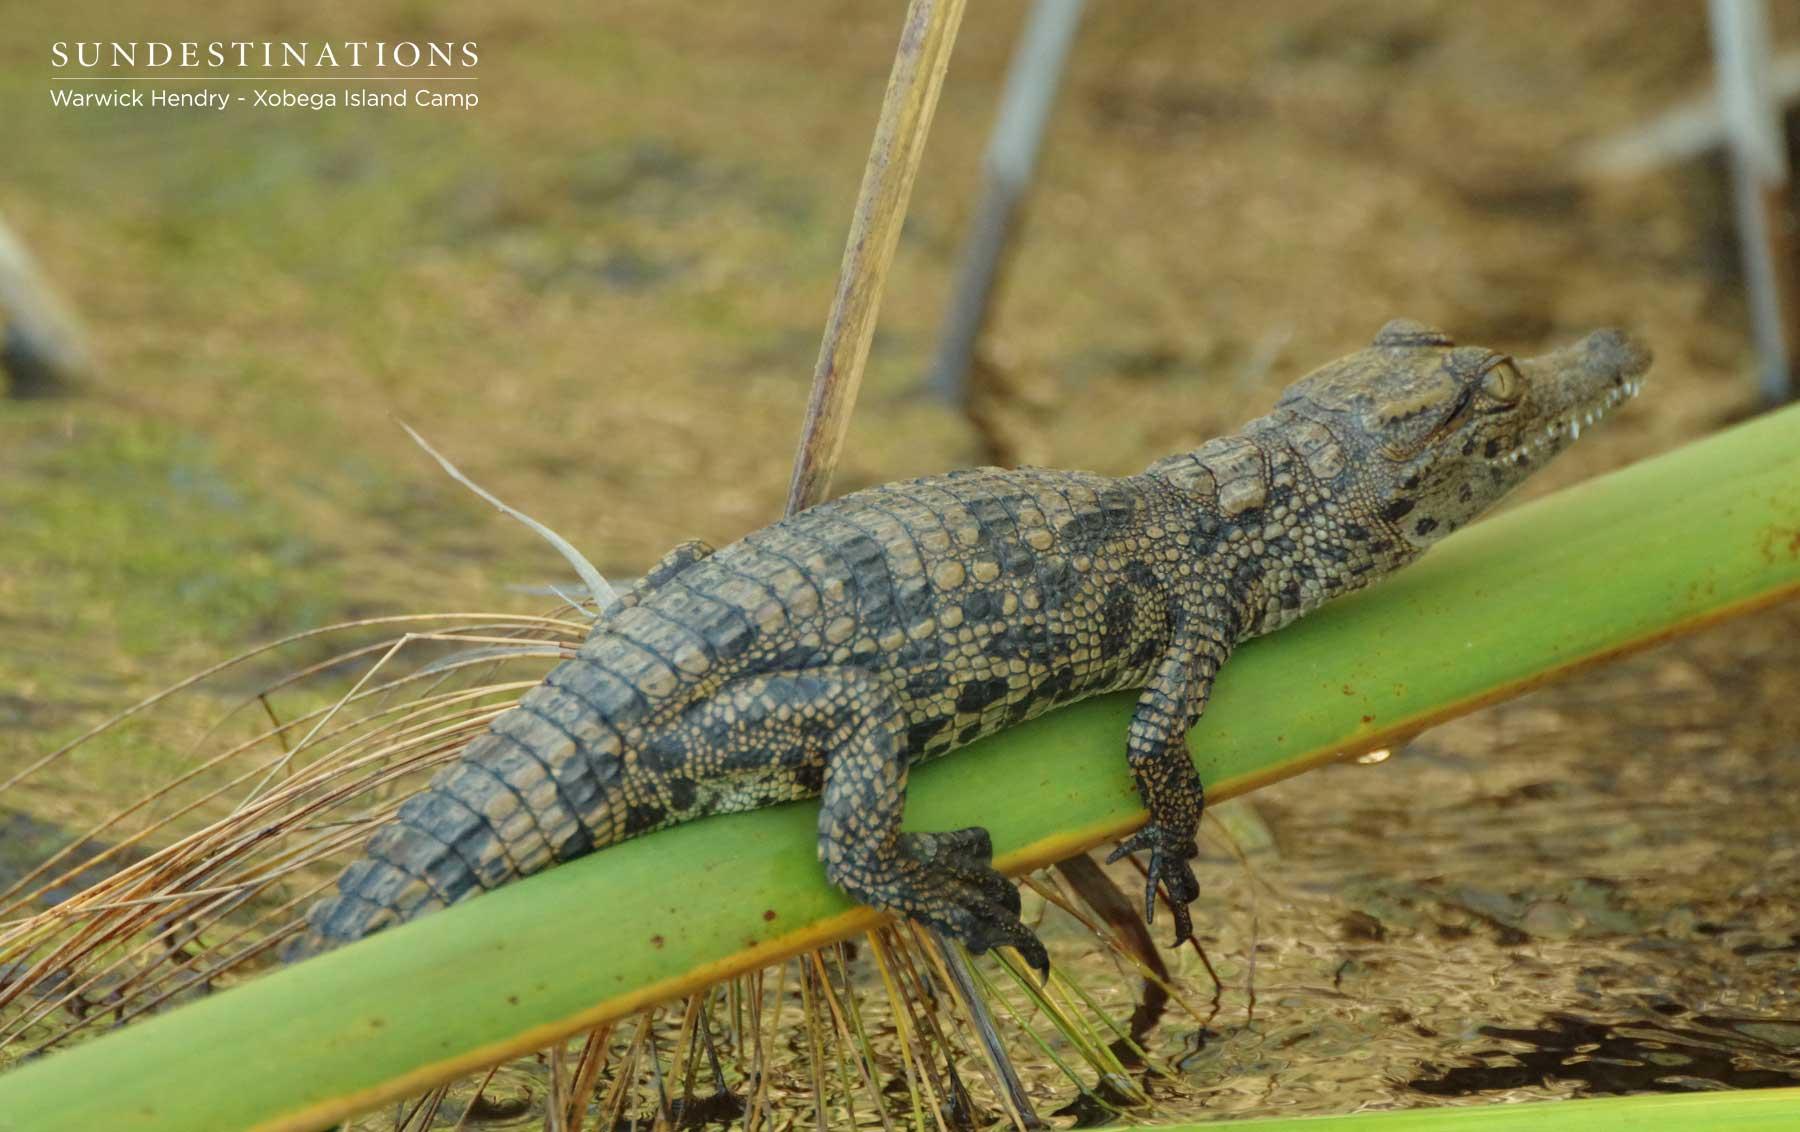 Nile Crocodile Xobega